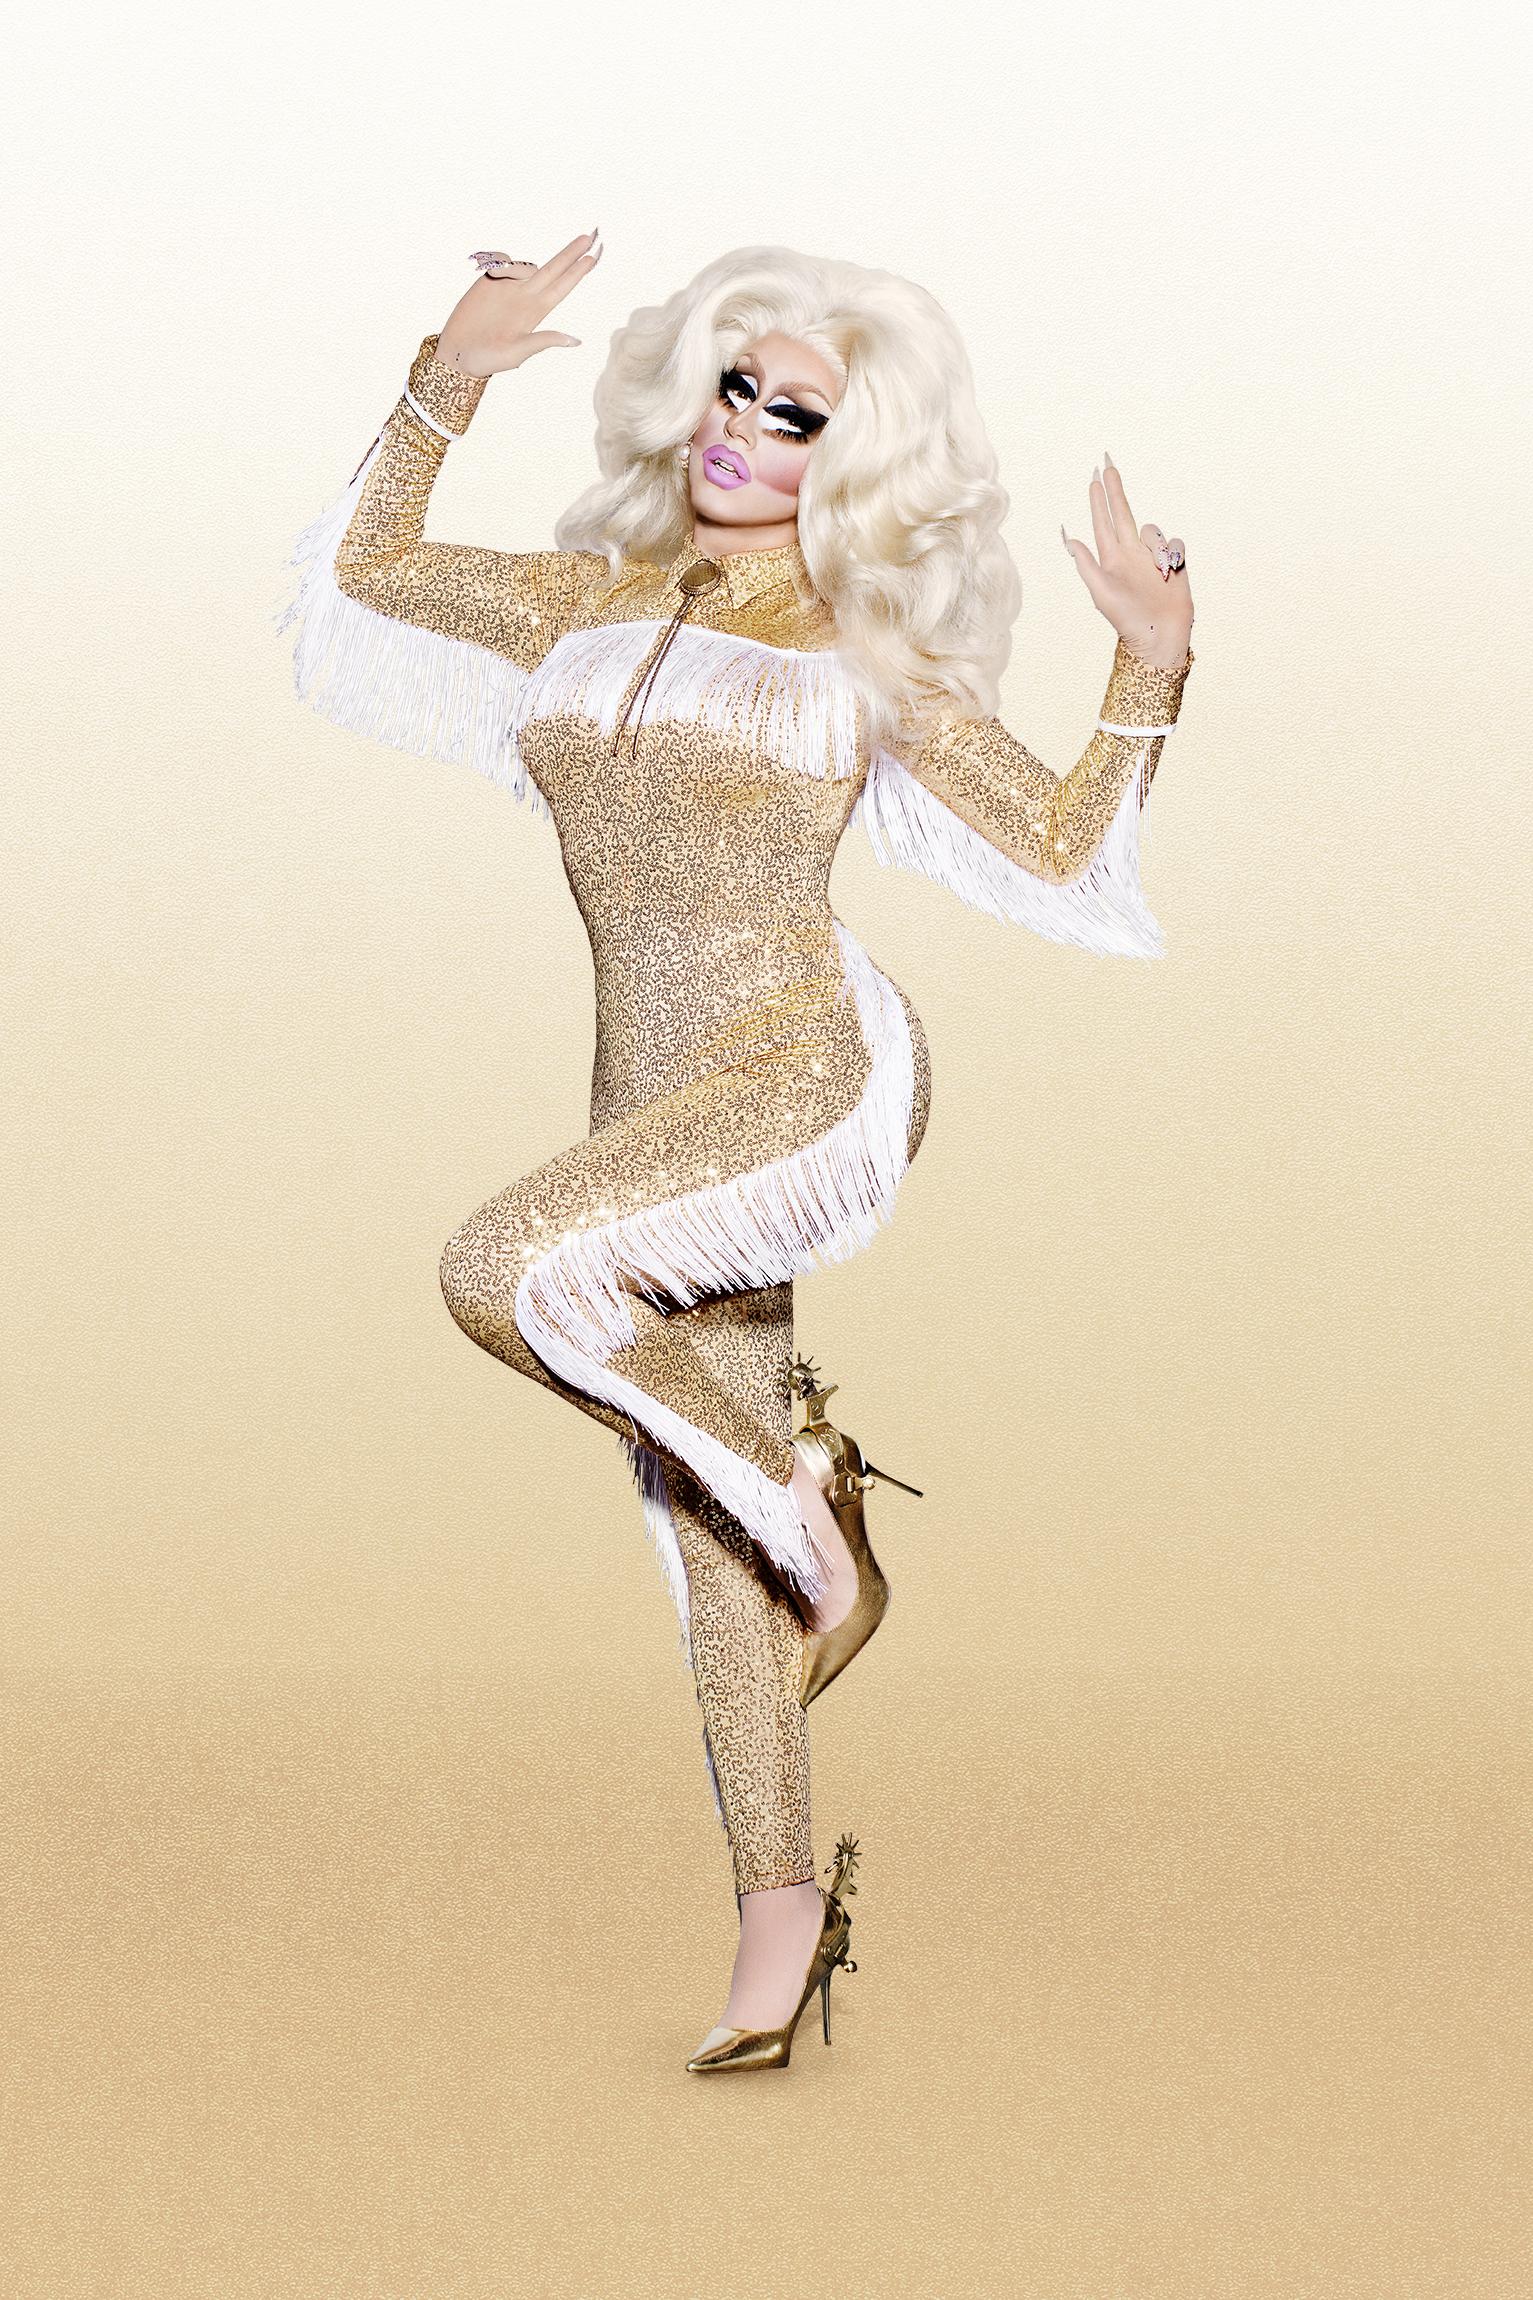 Trixie Mattel Drag Race